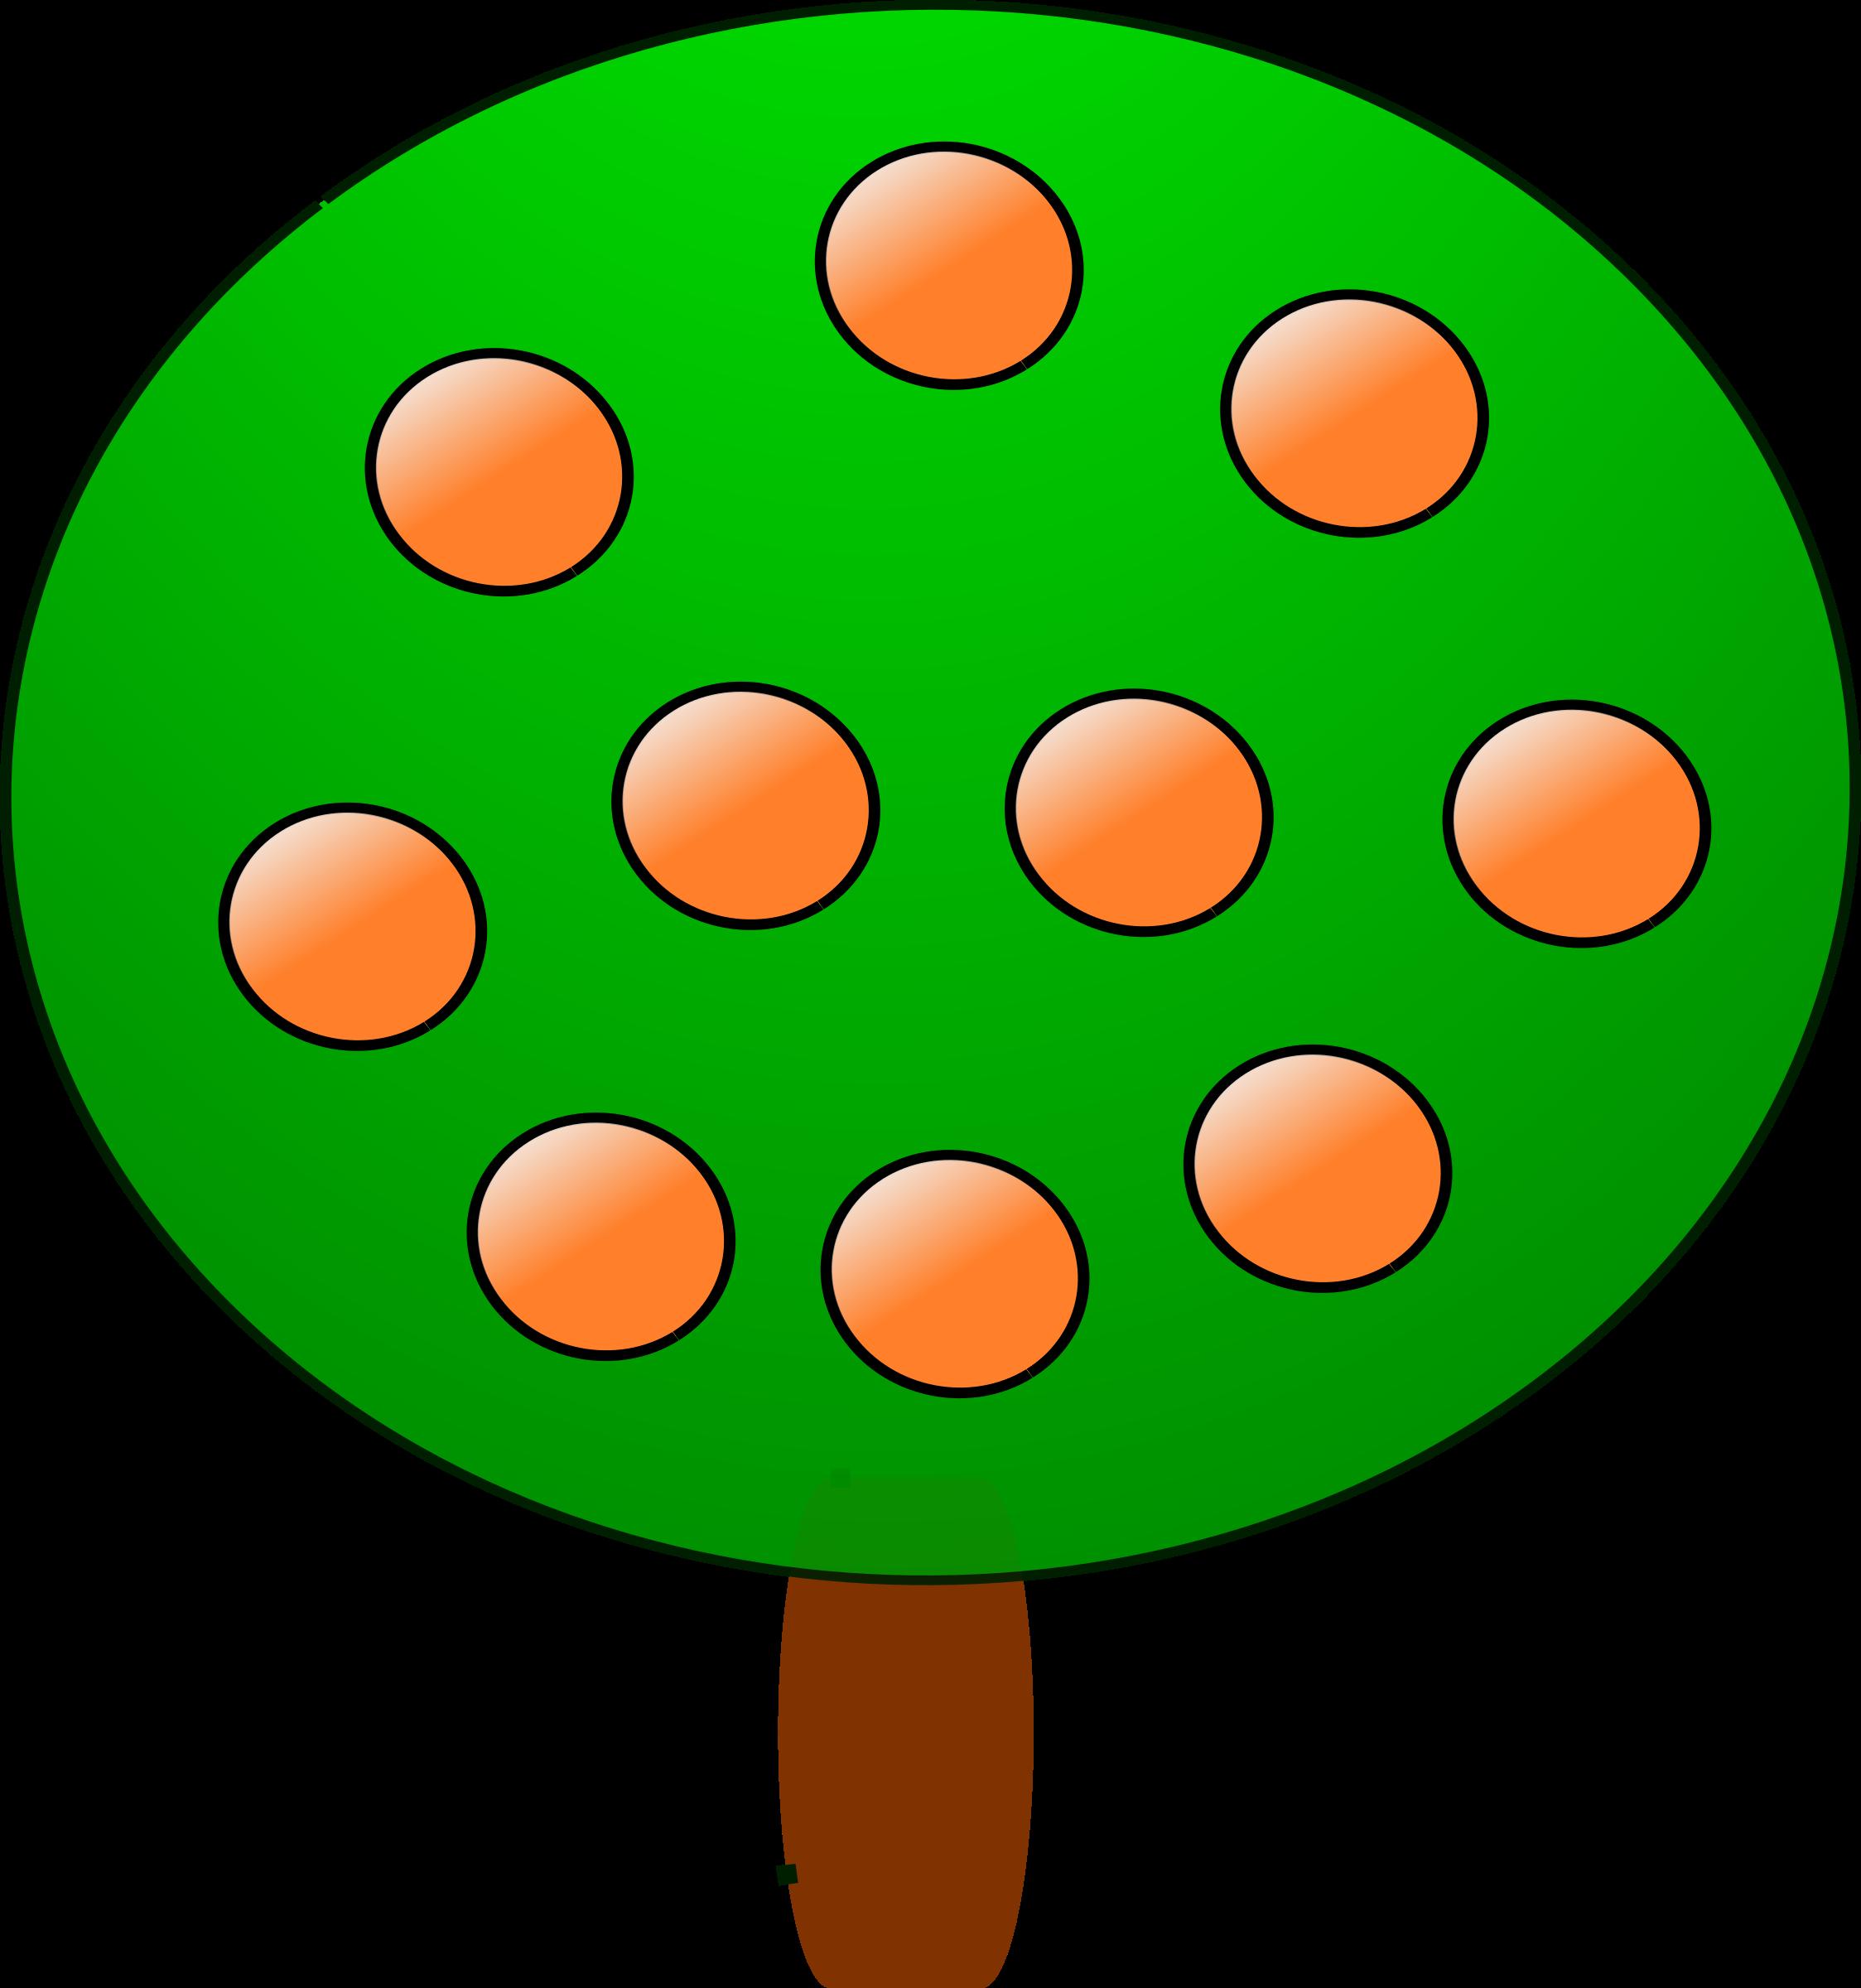 Orange big image png. Fruit clipart tree